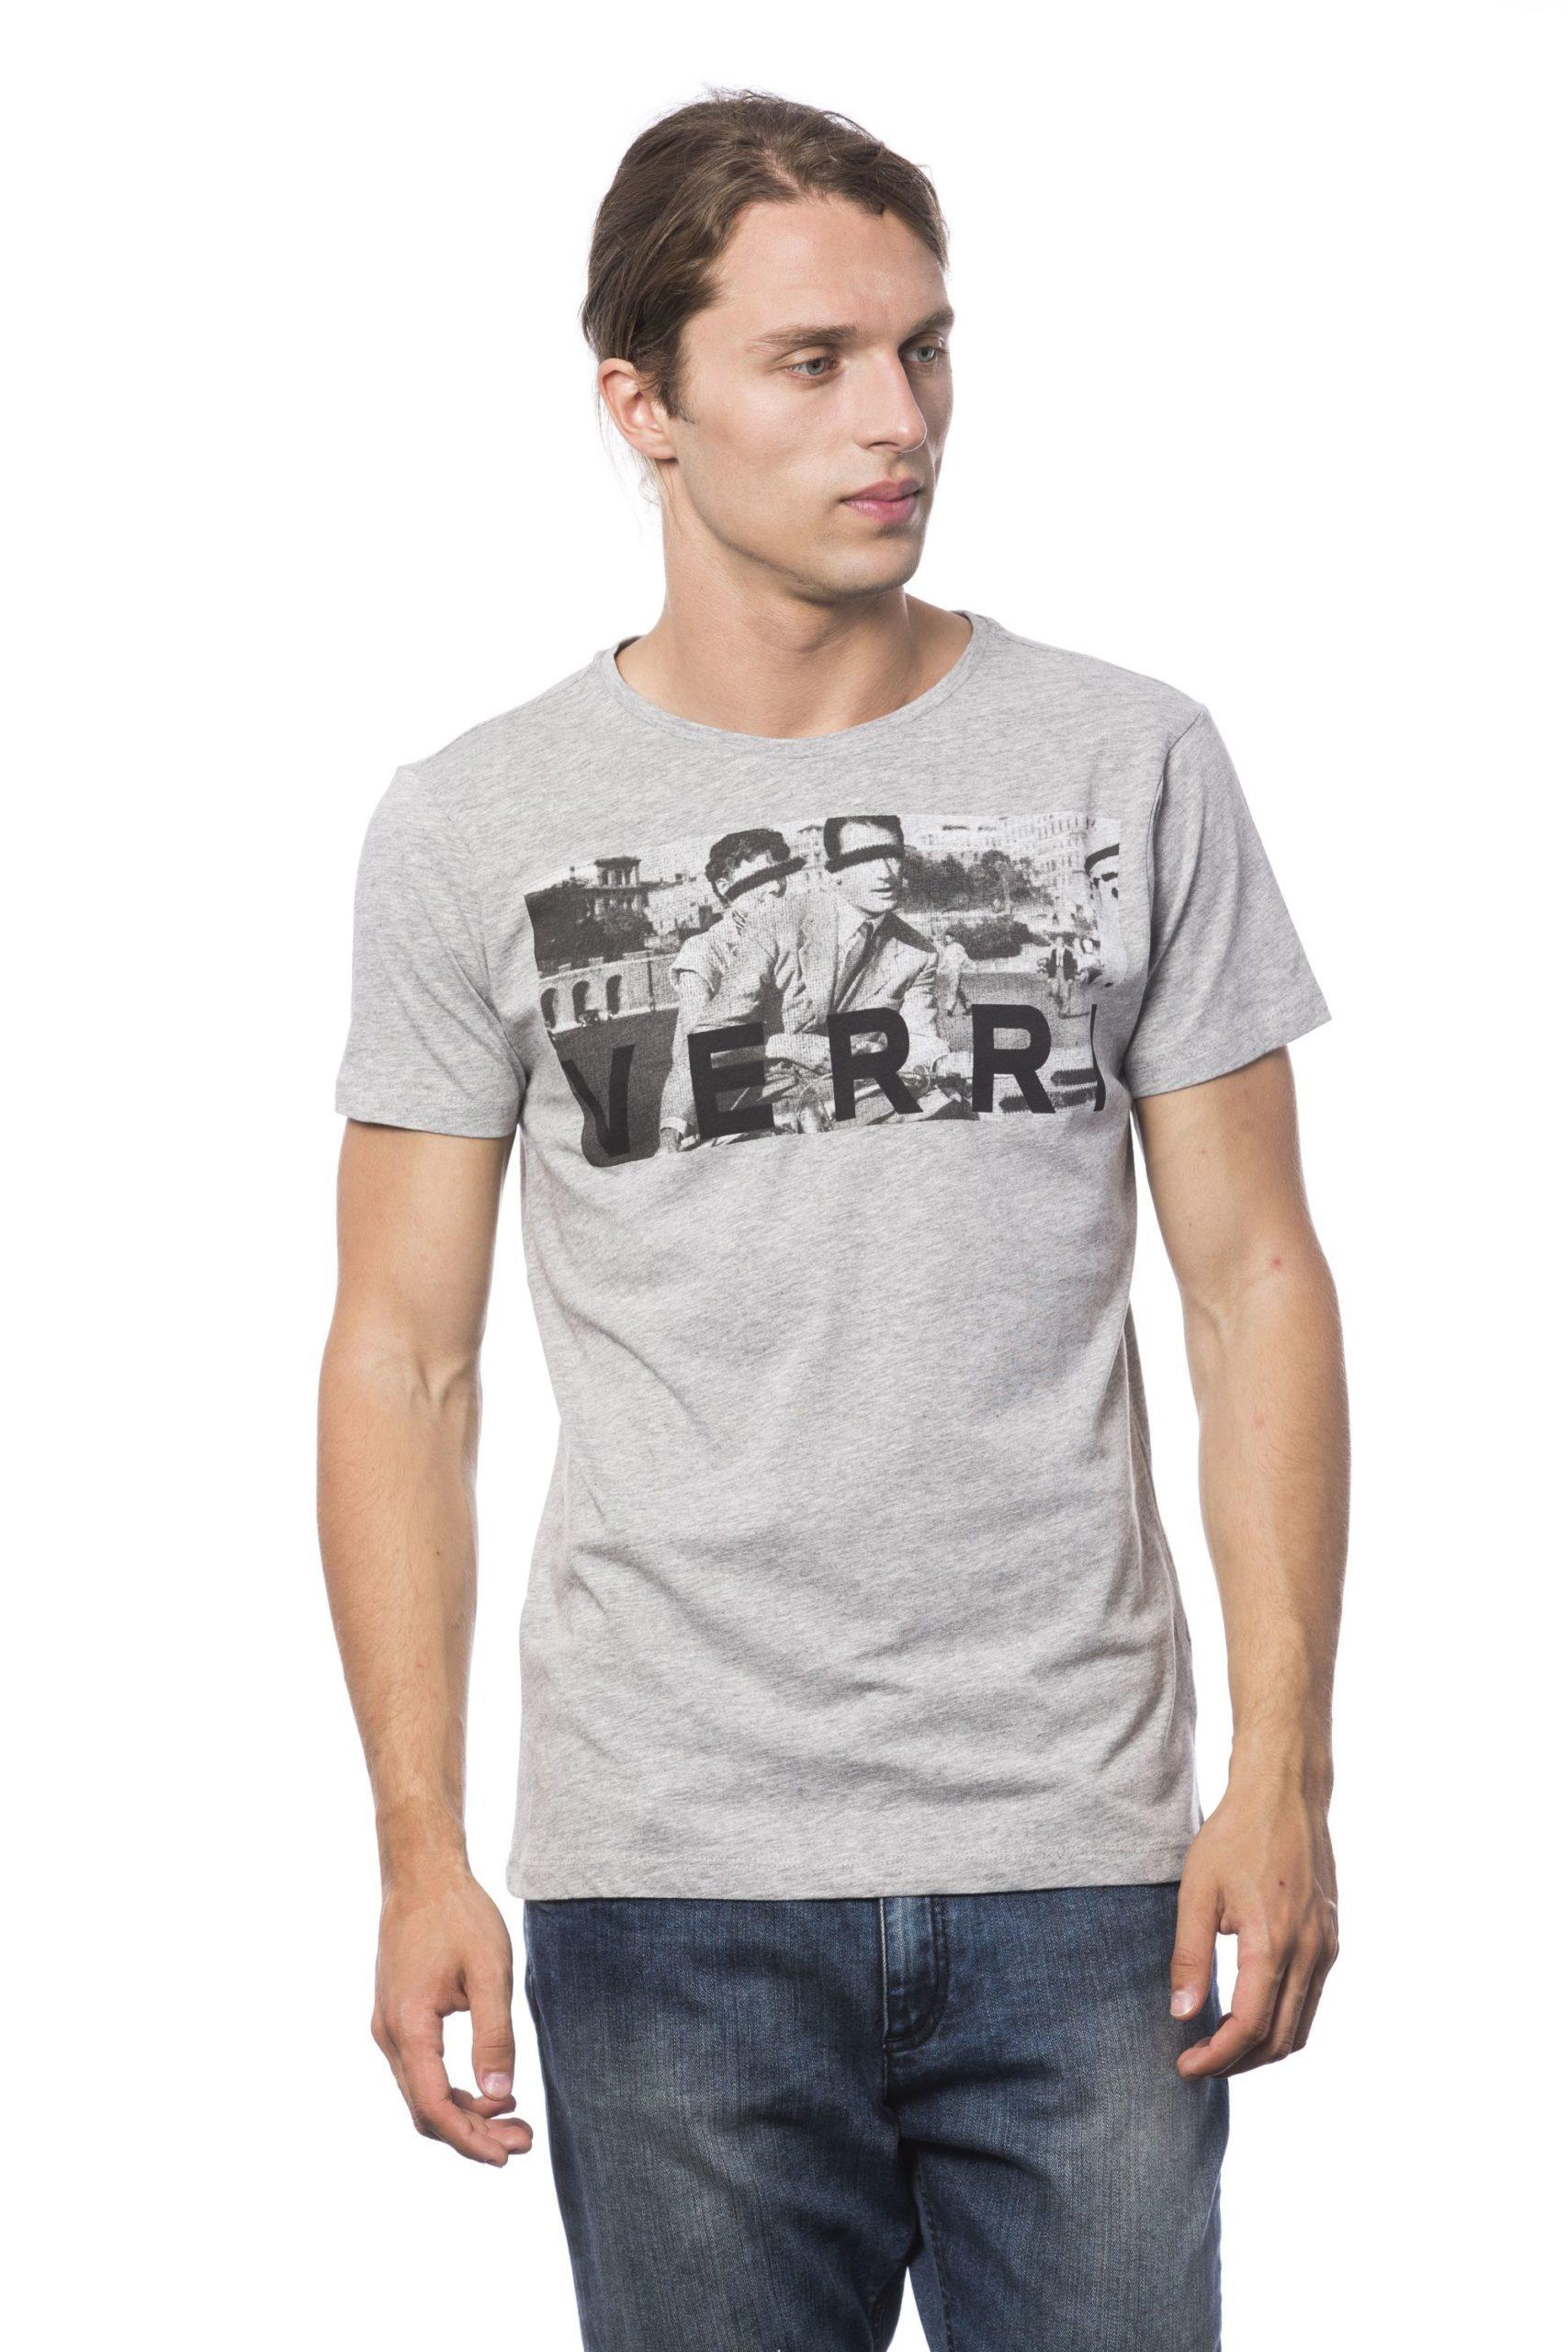 Verri Men's Grigio Ml Grey Ml T-Shirt Gray VE688457 - L